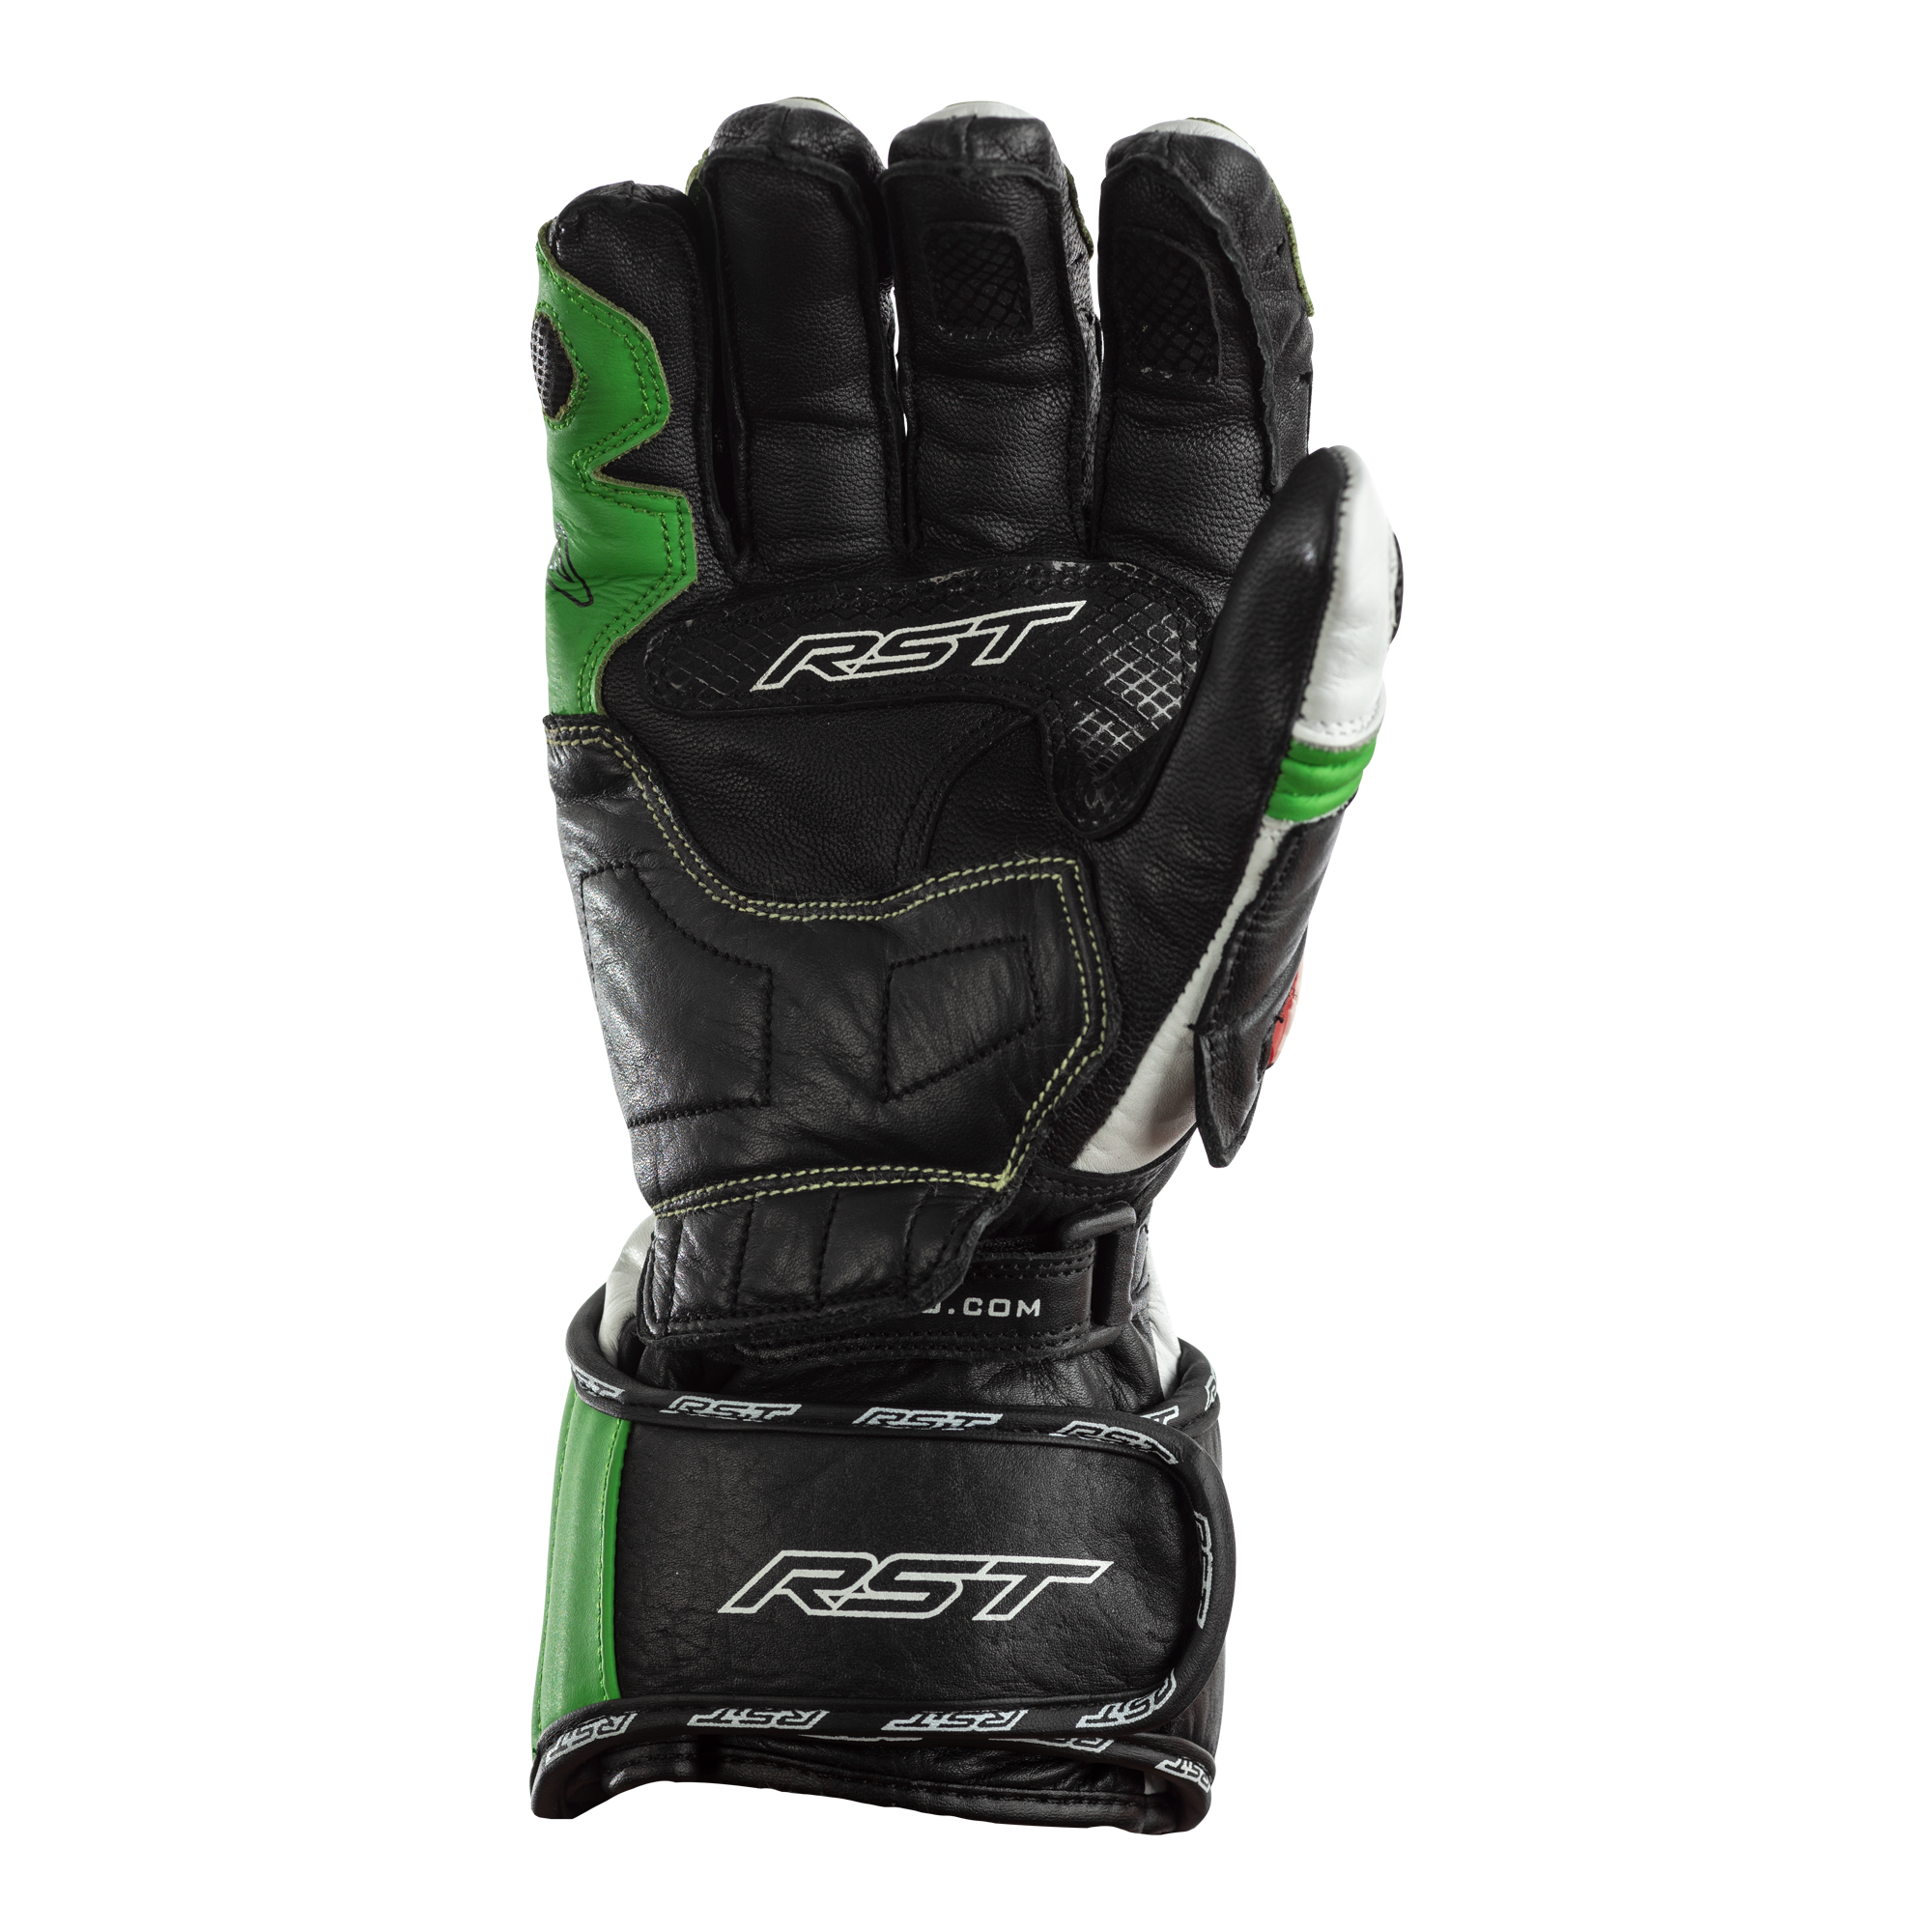 RST TRACTECH EVO Kawasaki Green Motorbike CE Leather Sports Gloves